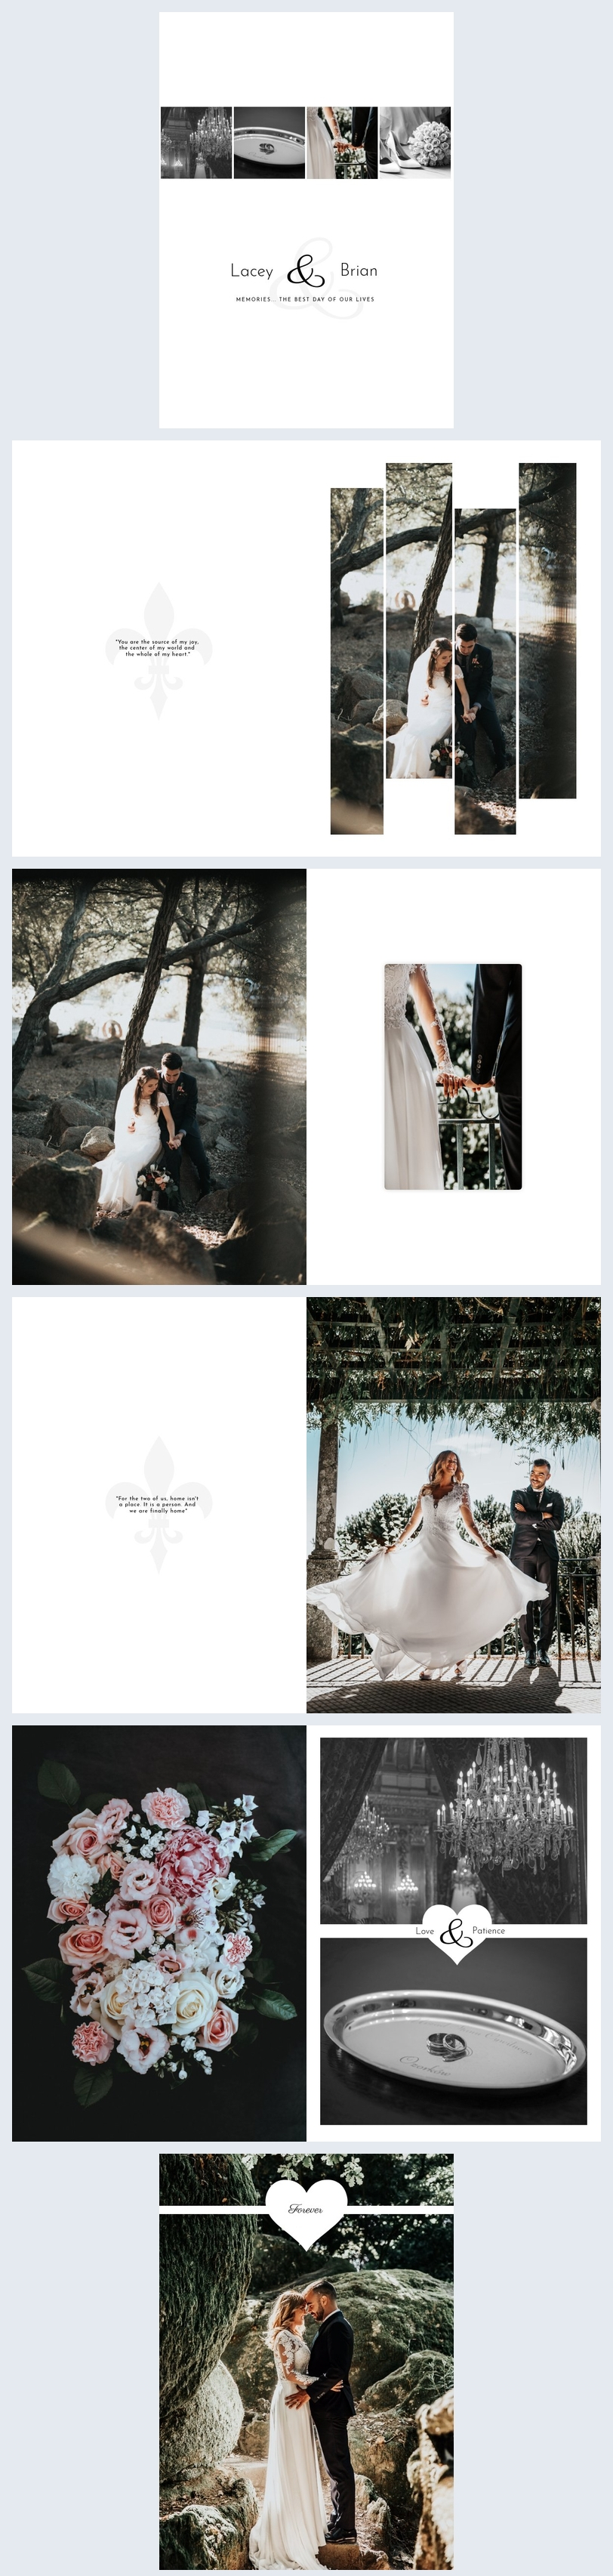 Modern Wedding Photo Album Template